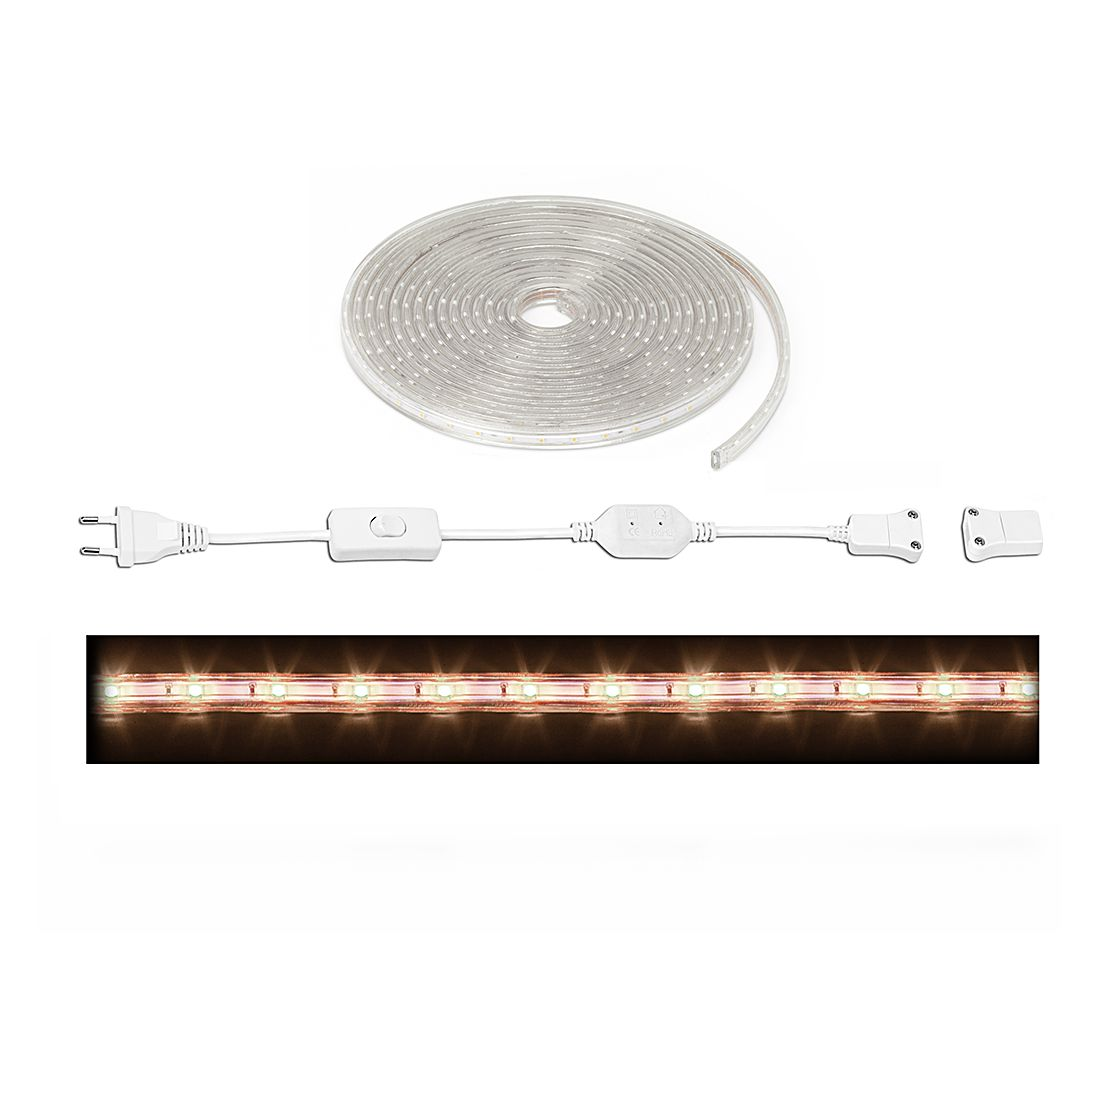 EEK A+, LED-Streifen Sally – Metall/- – Silber – 5-flammig, Brilliant online bestellen